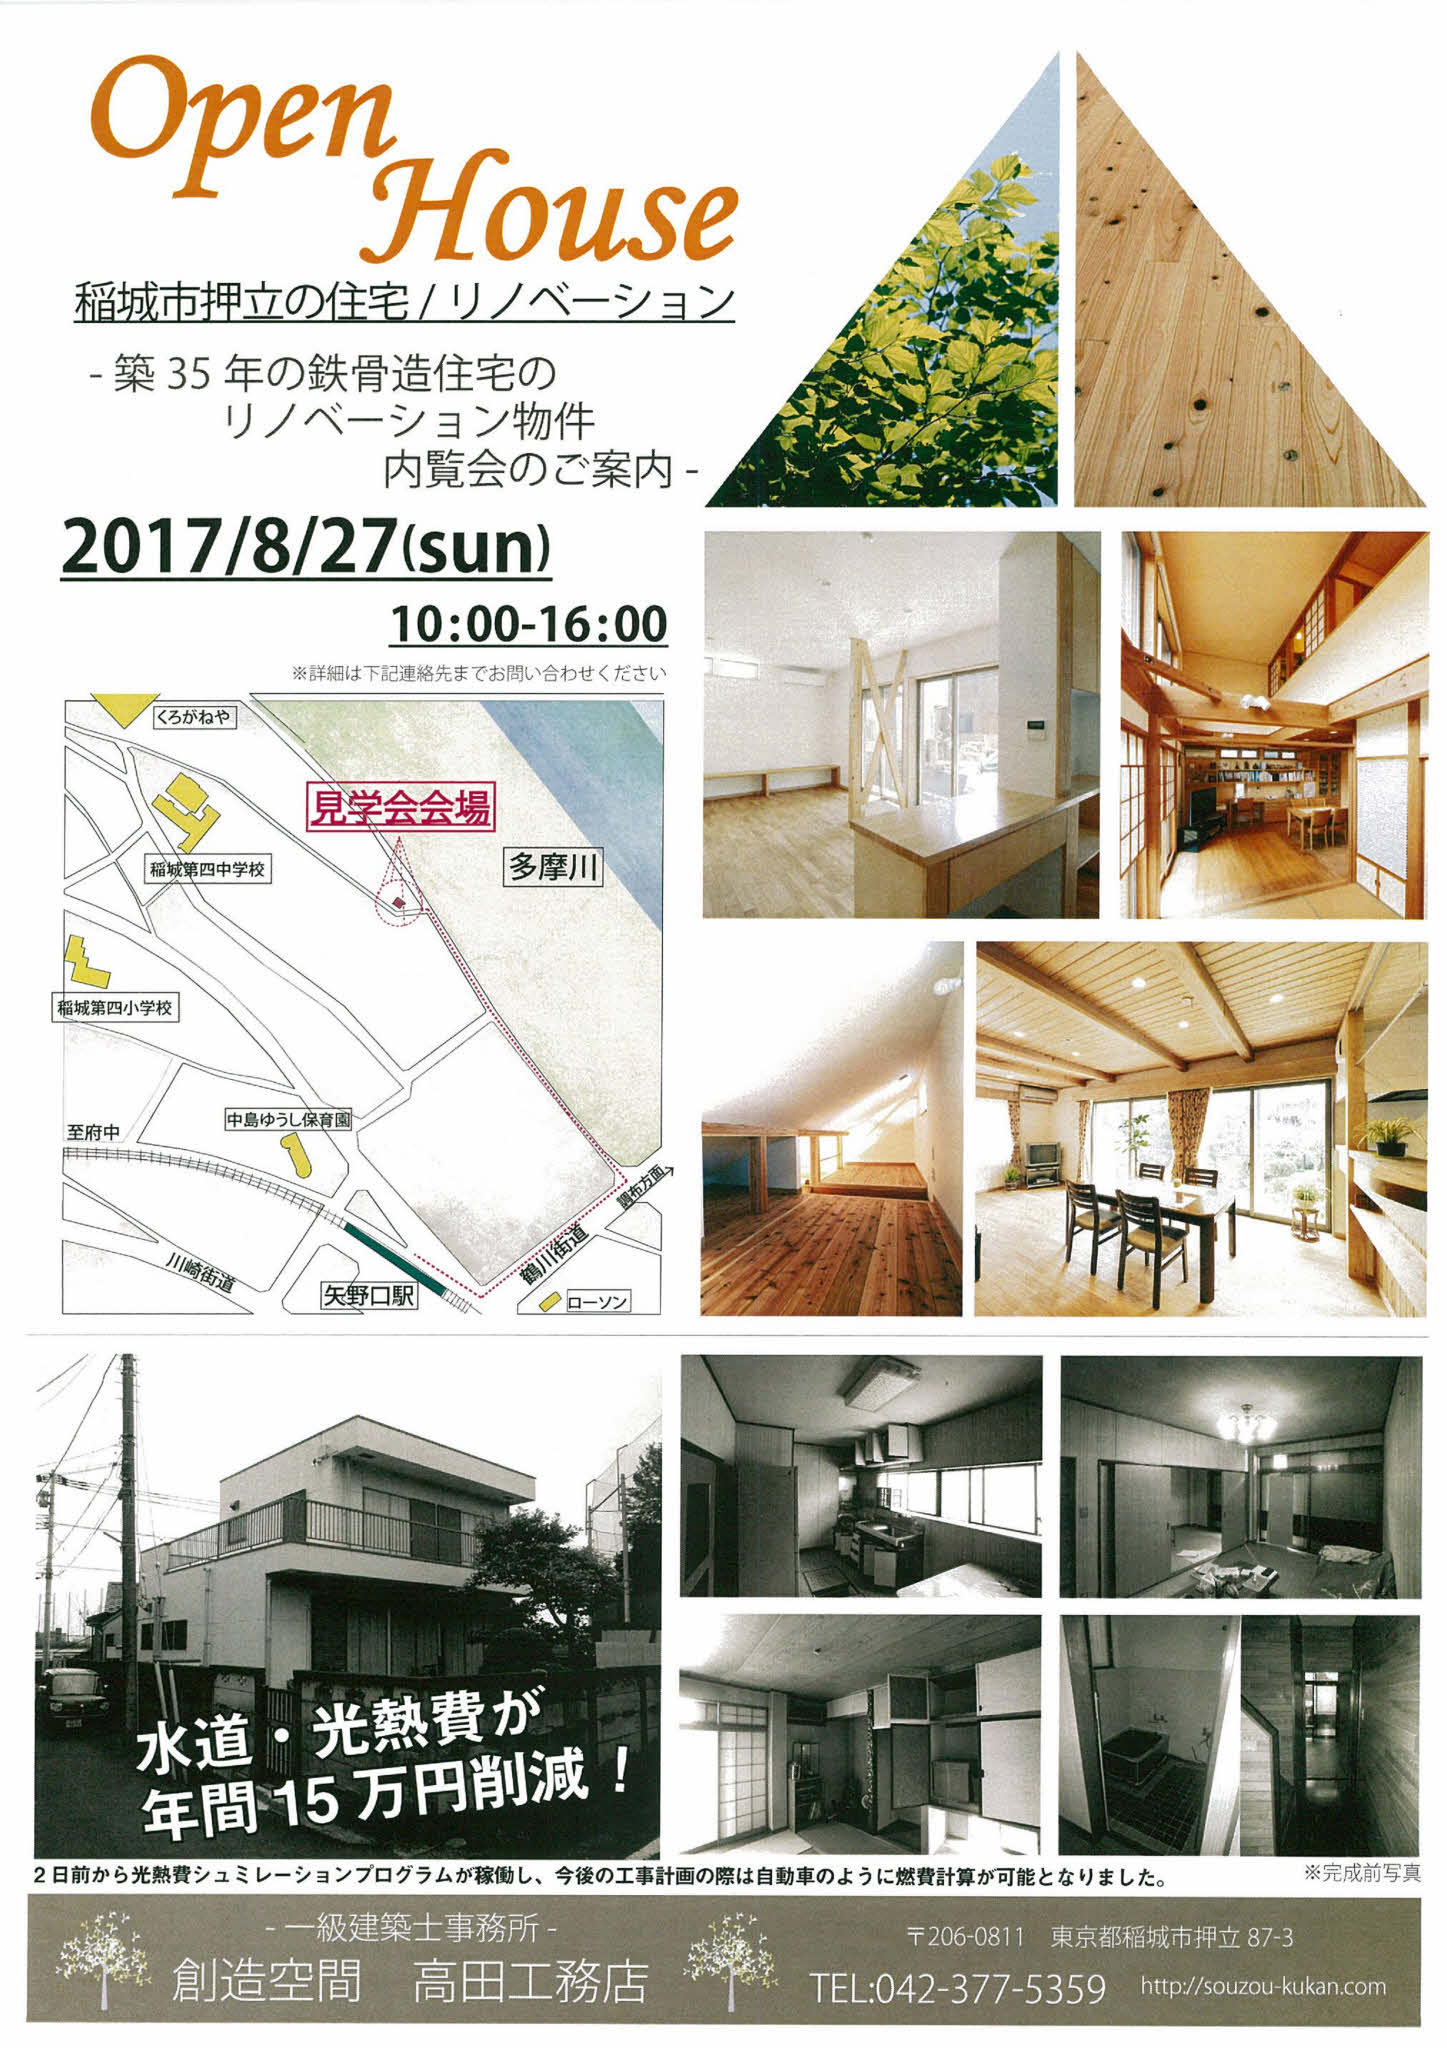 openhouse20170805.jpg